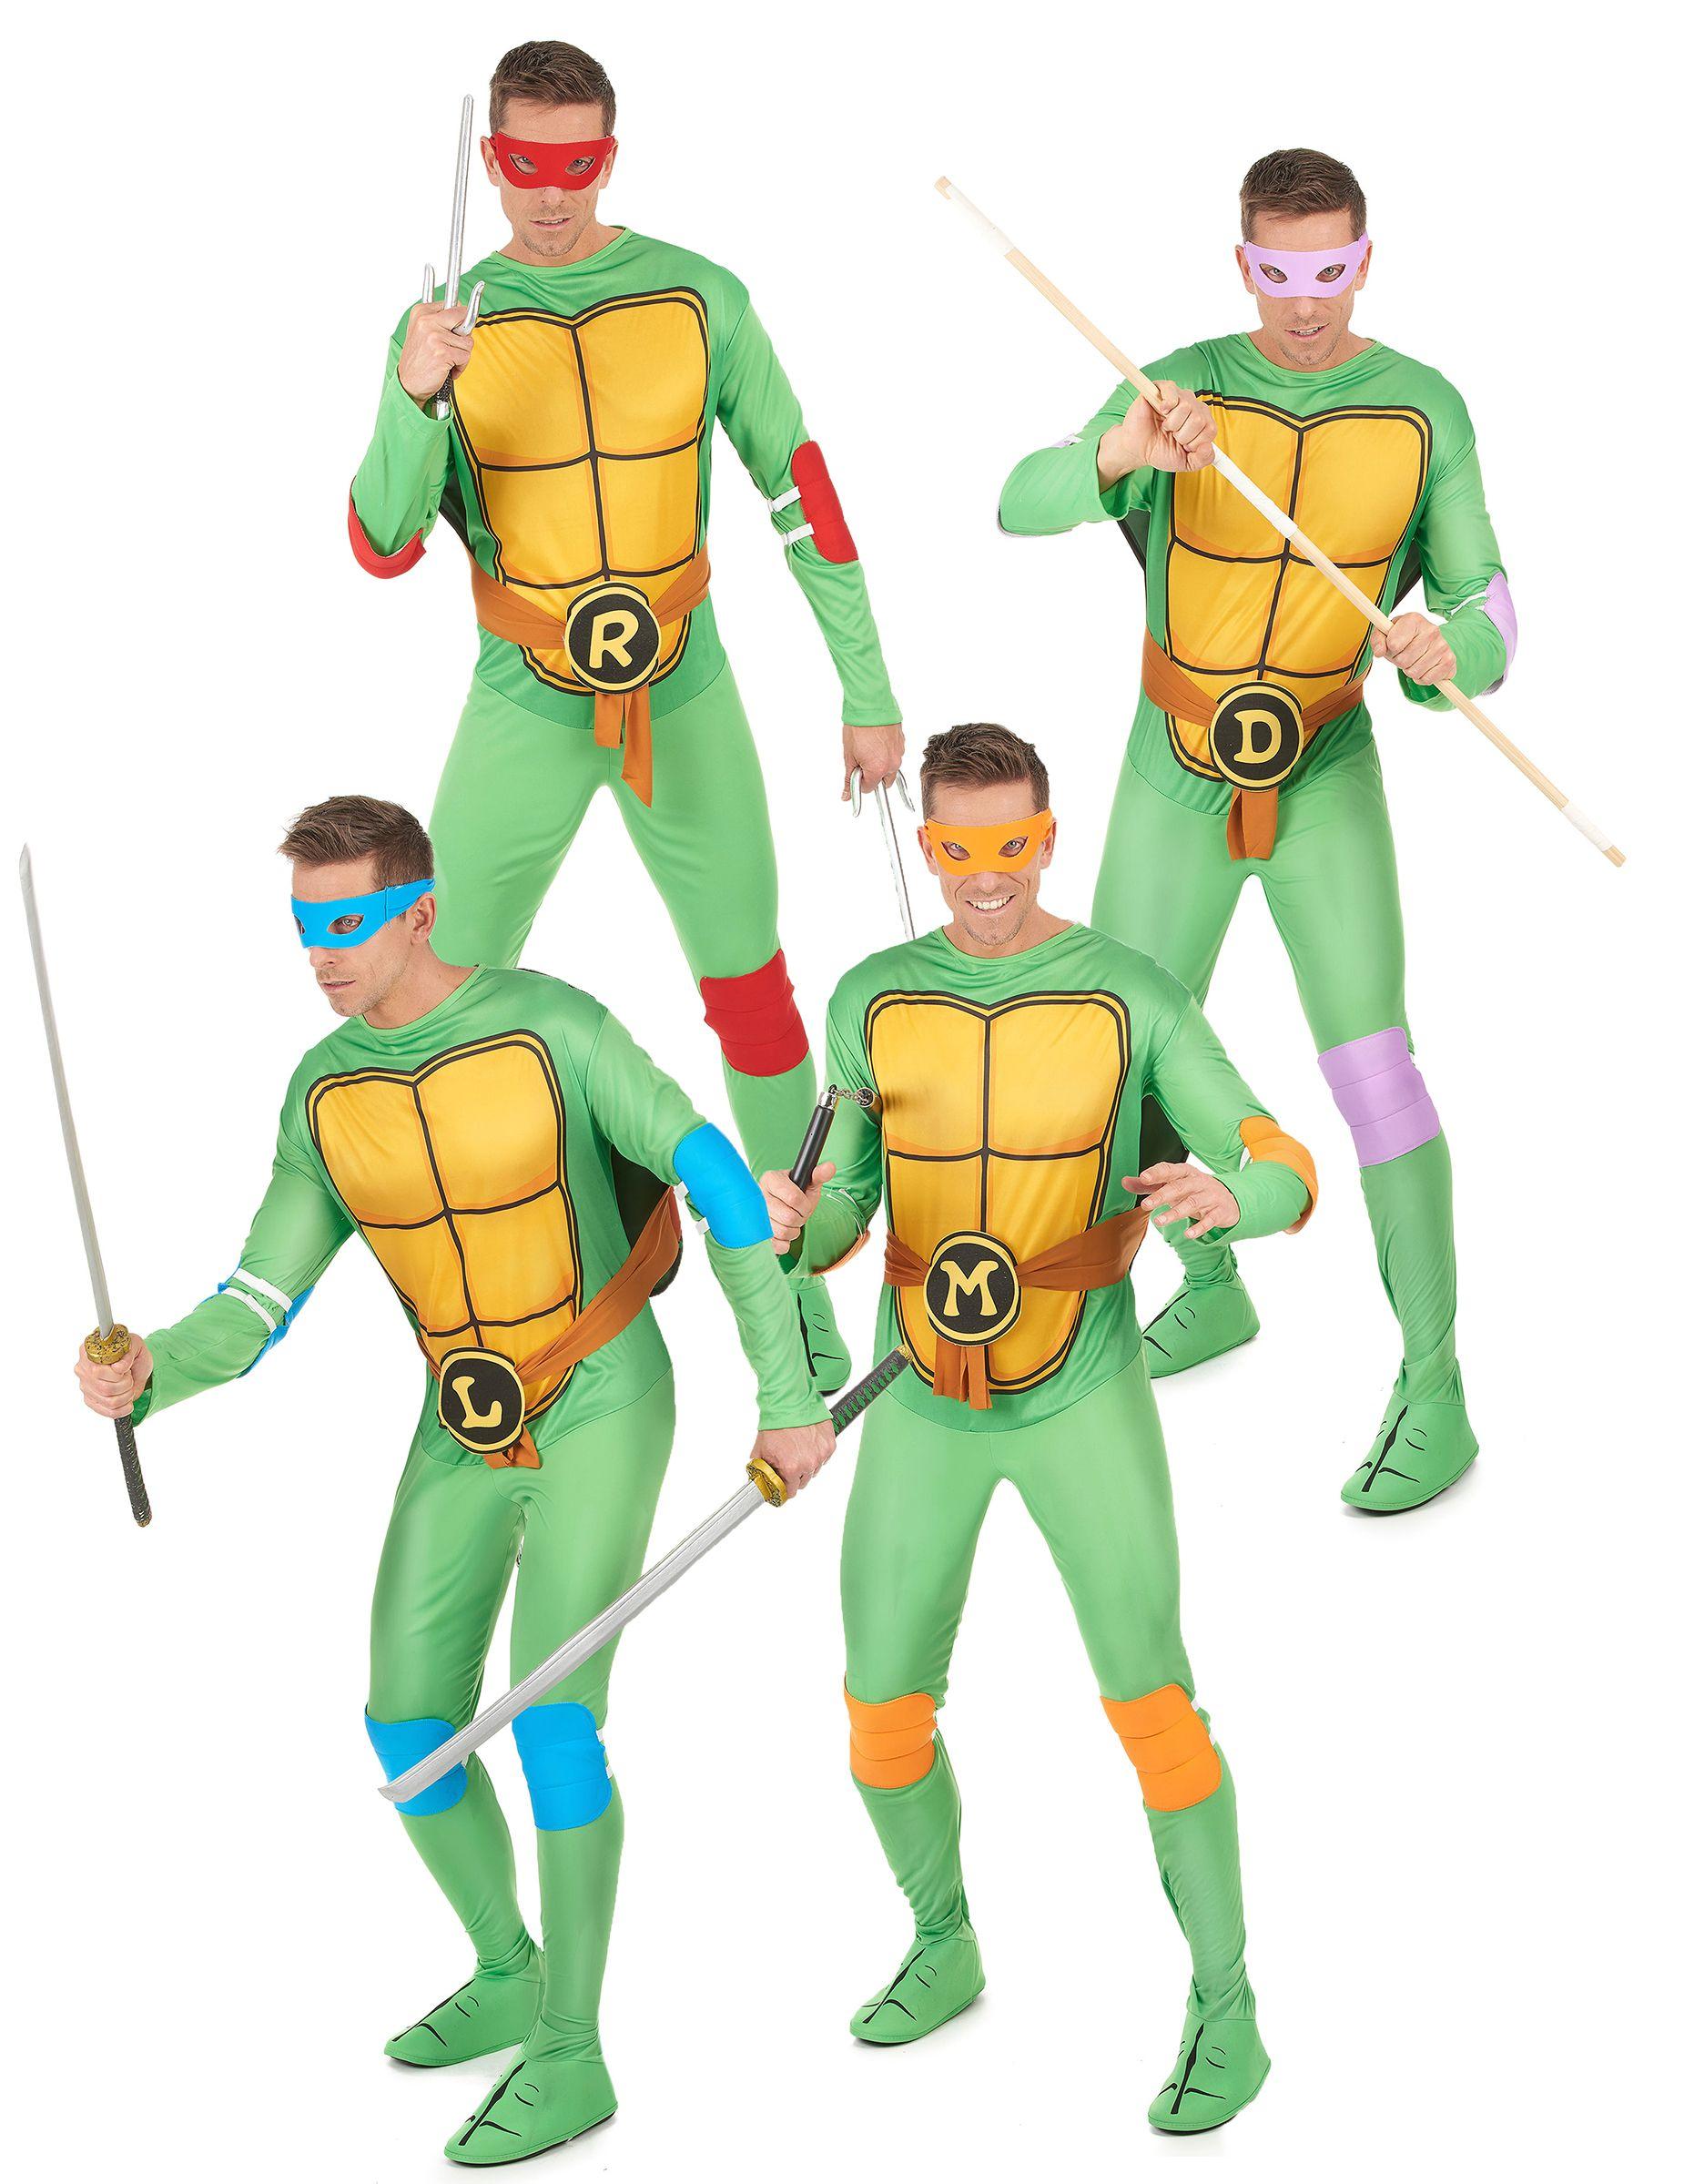 d944a4d7e0 Incluye 4 disfraces para adulto de Tortugas Ninja.Cada disfraz incluye traje